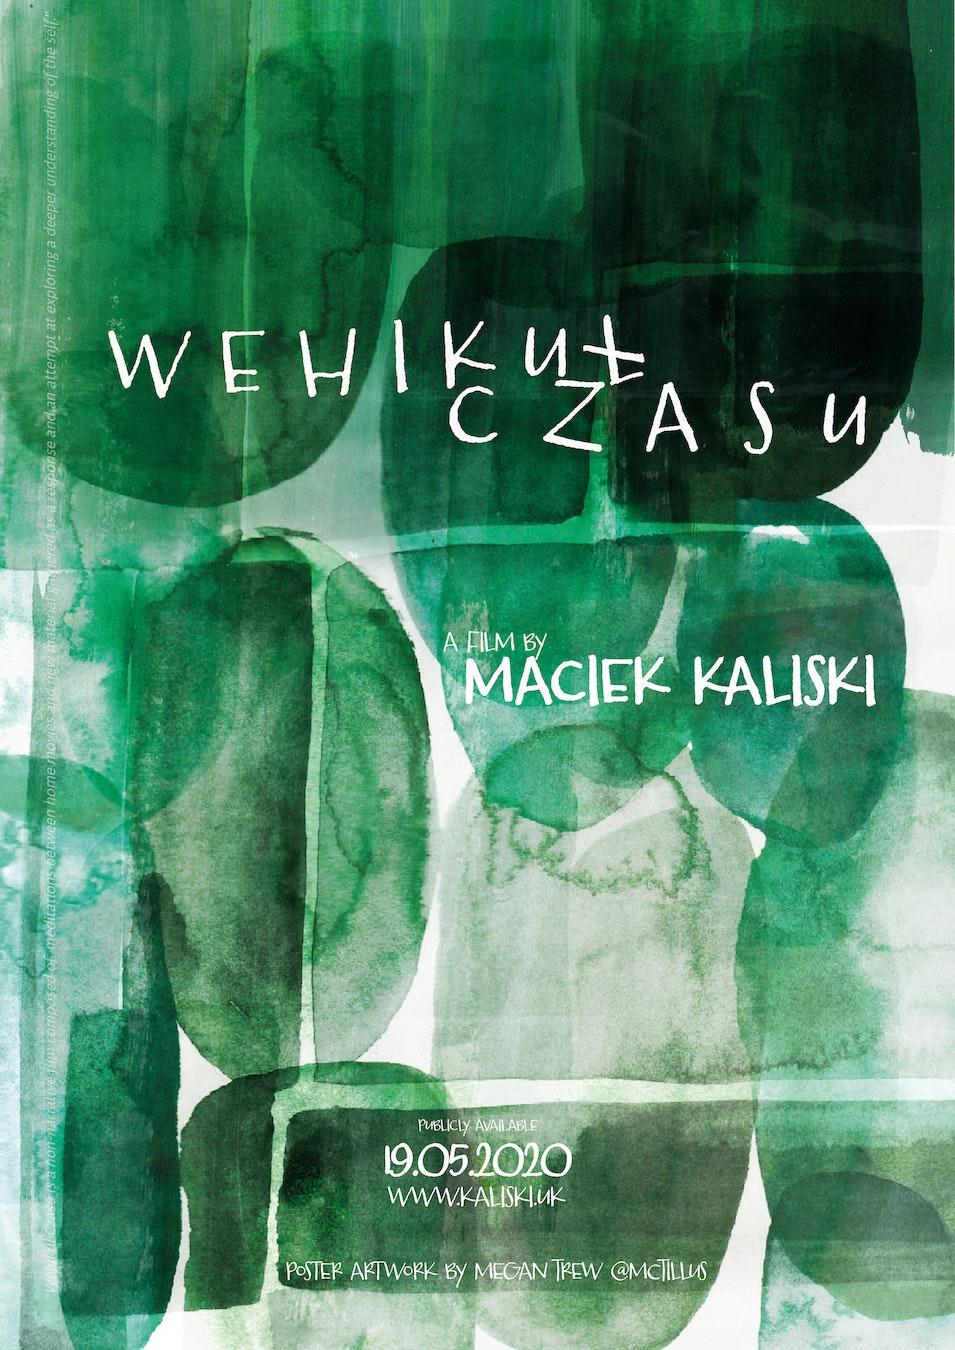 0045_wehikulczasu_poster_01_small